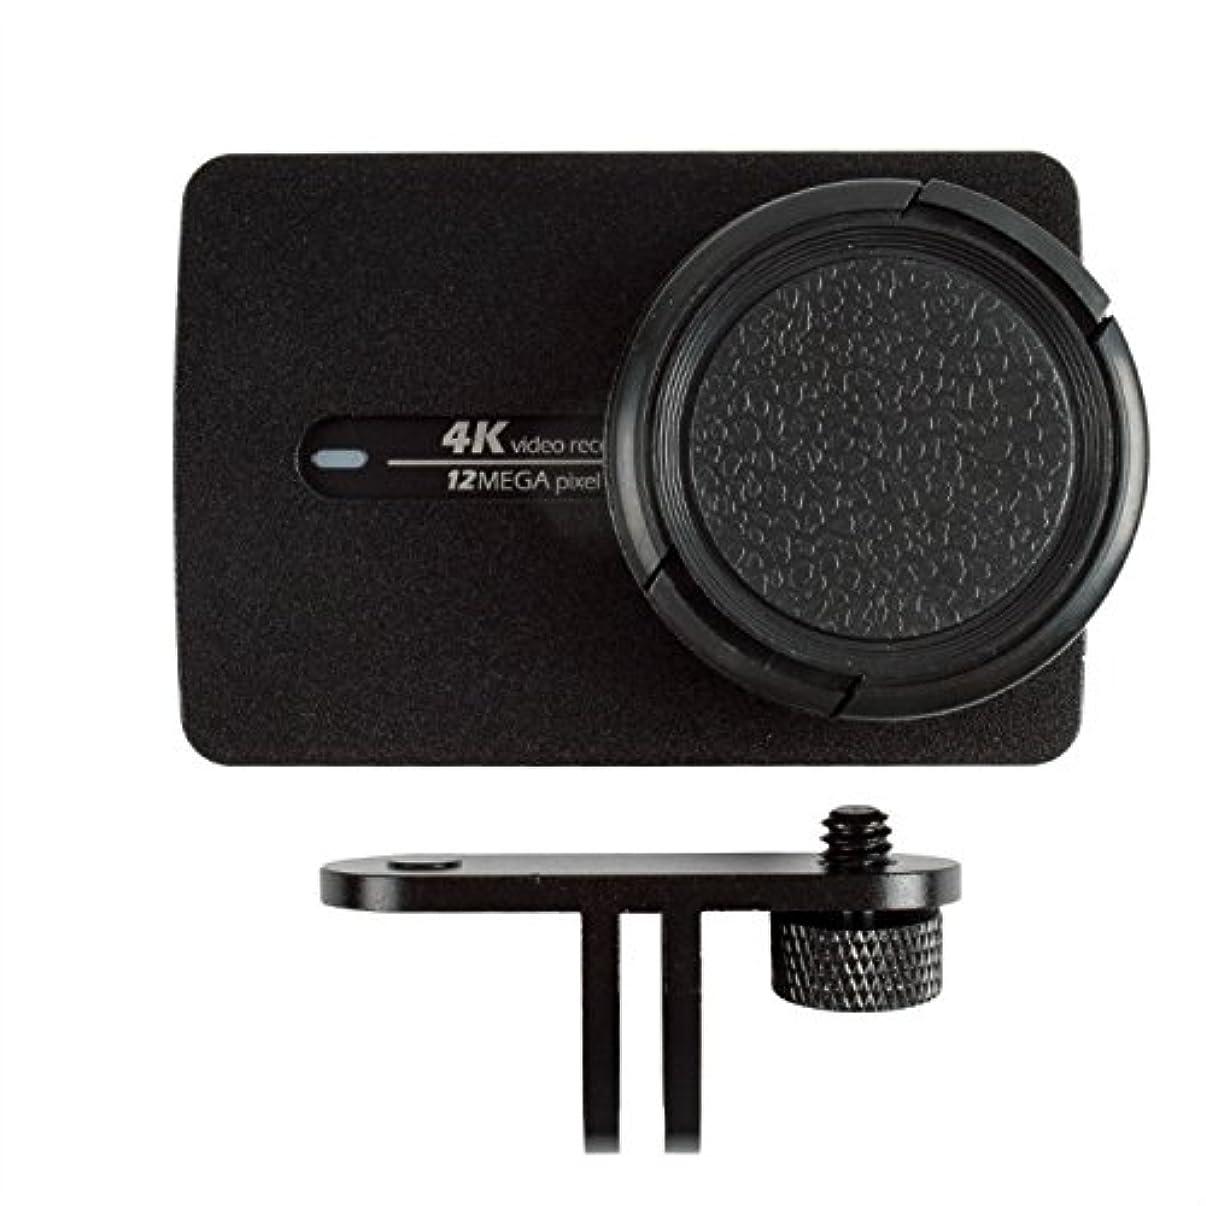 ADIKA Metal Frame Protective Case for Xiaomi Yi 4K Action Camera Black